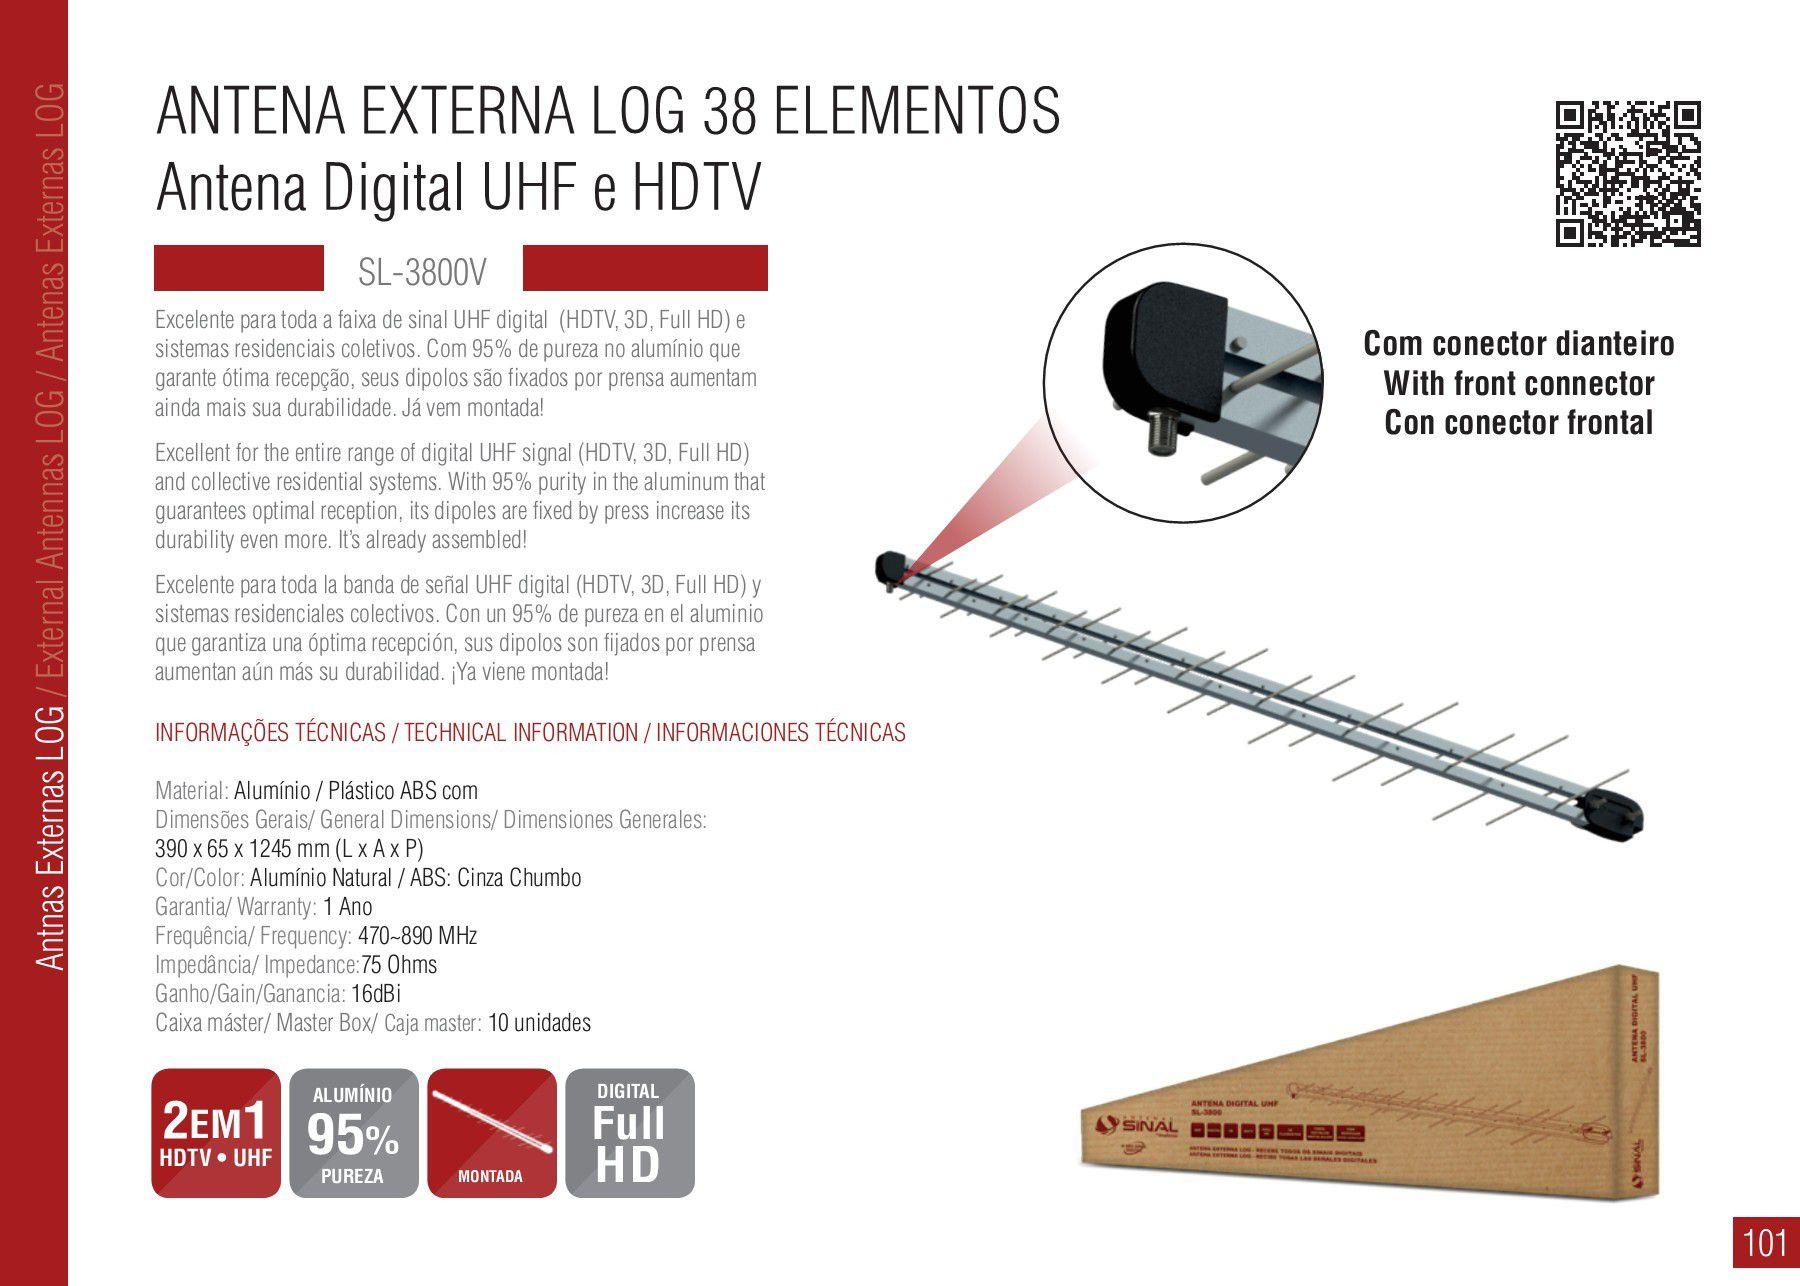 Antena Externa Log 38 elementos Sinal UHF, Digital e HDTV  SL-3800 PLUS